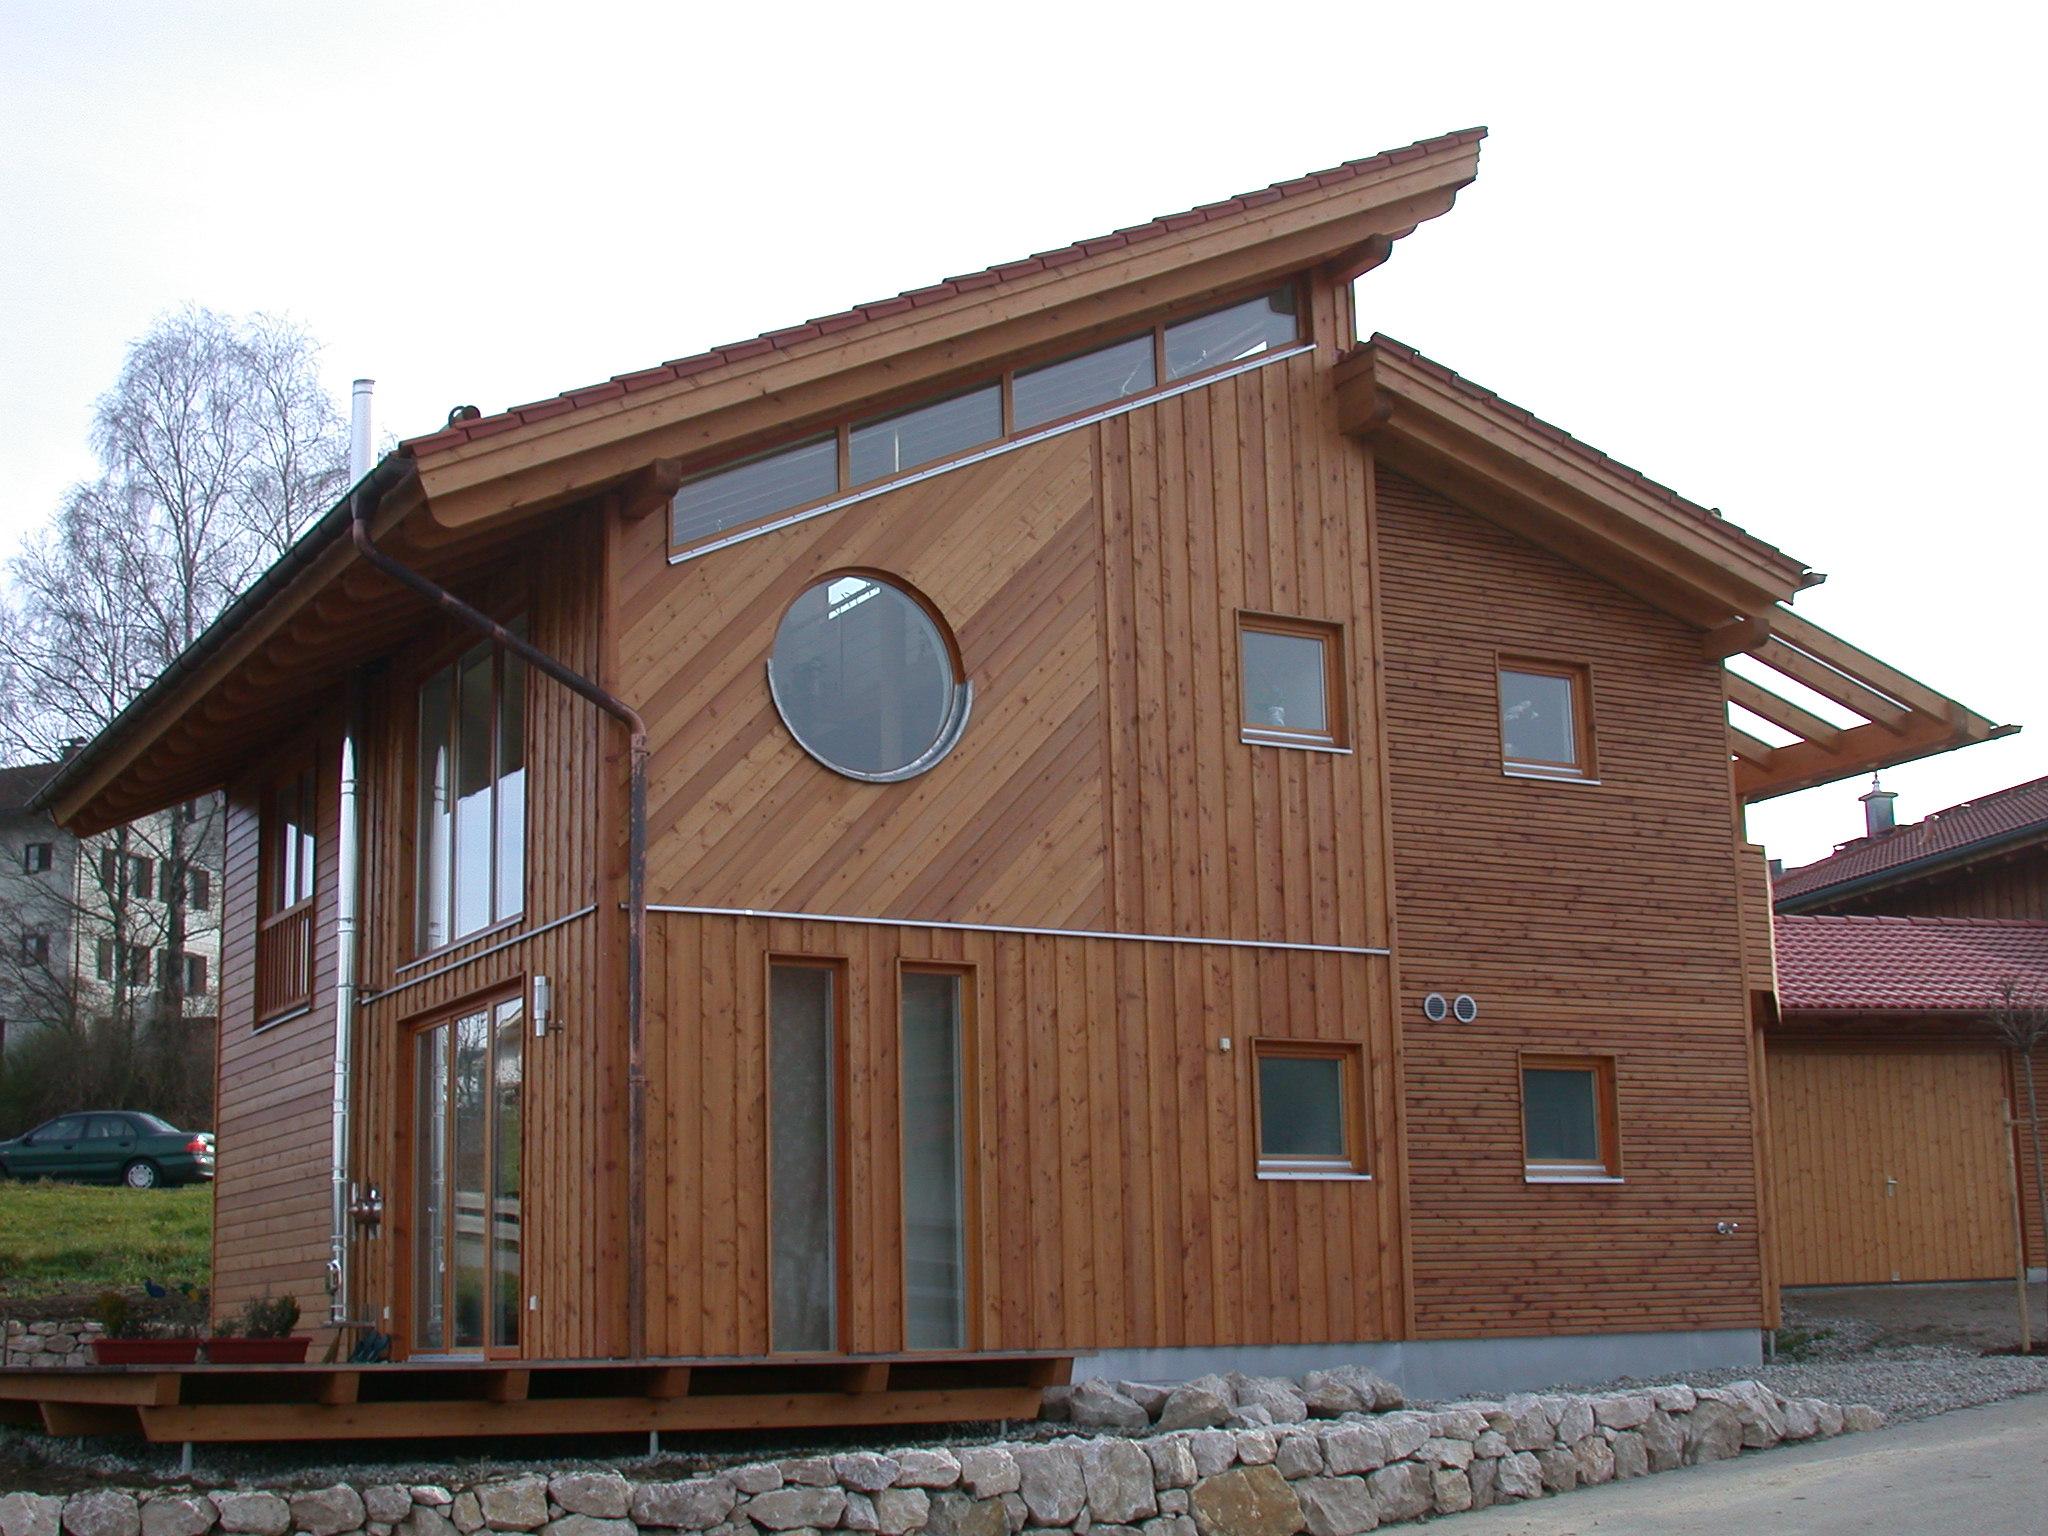 Einfamilienhaus in Bad Endorf, BJ 2003